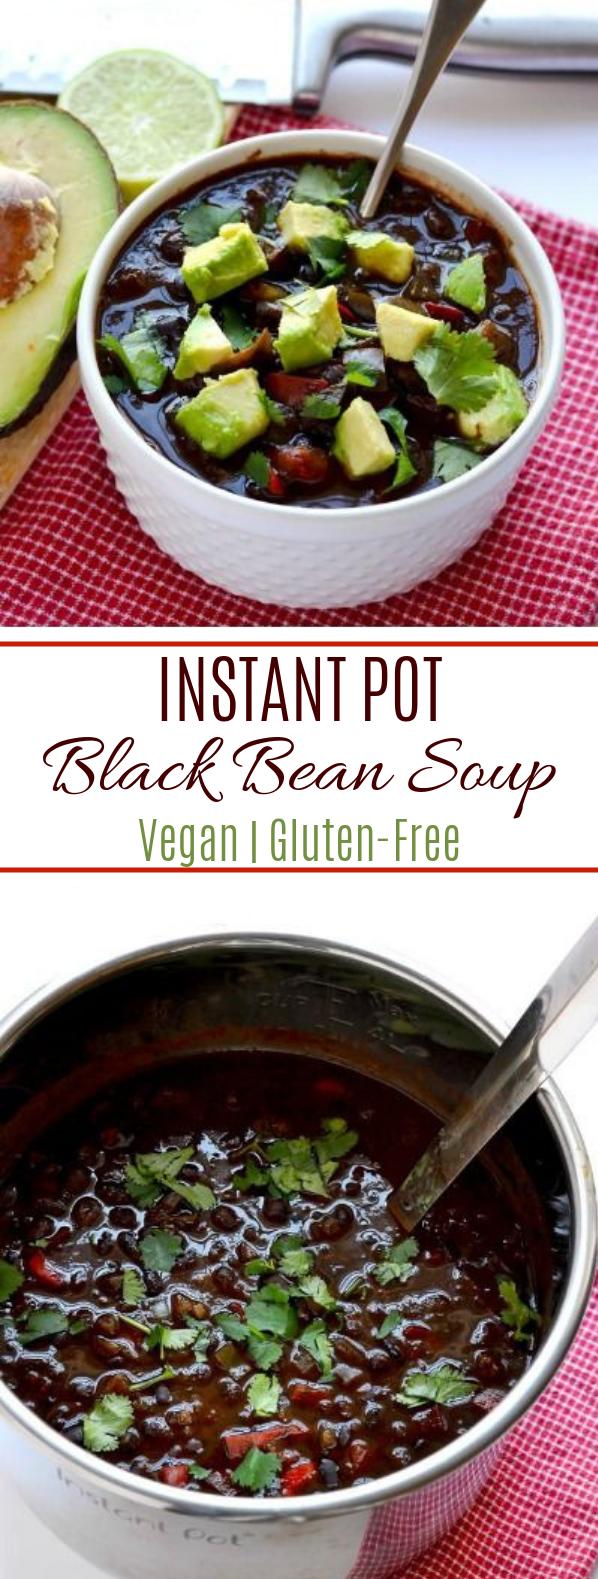 Instant Pot Black Bean Soup #Vegan #Gluten-Free